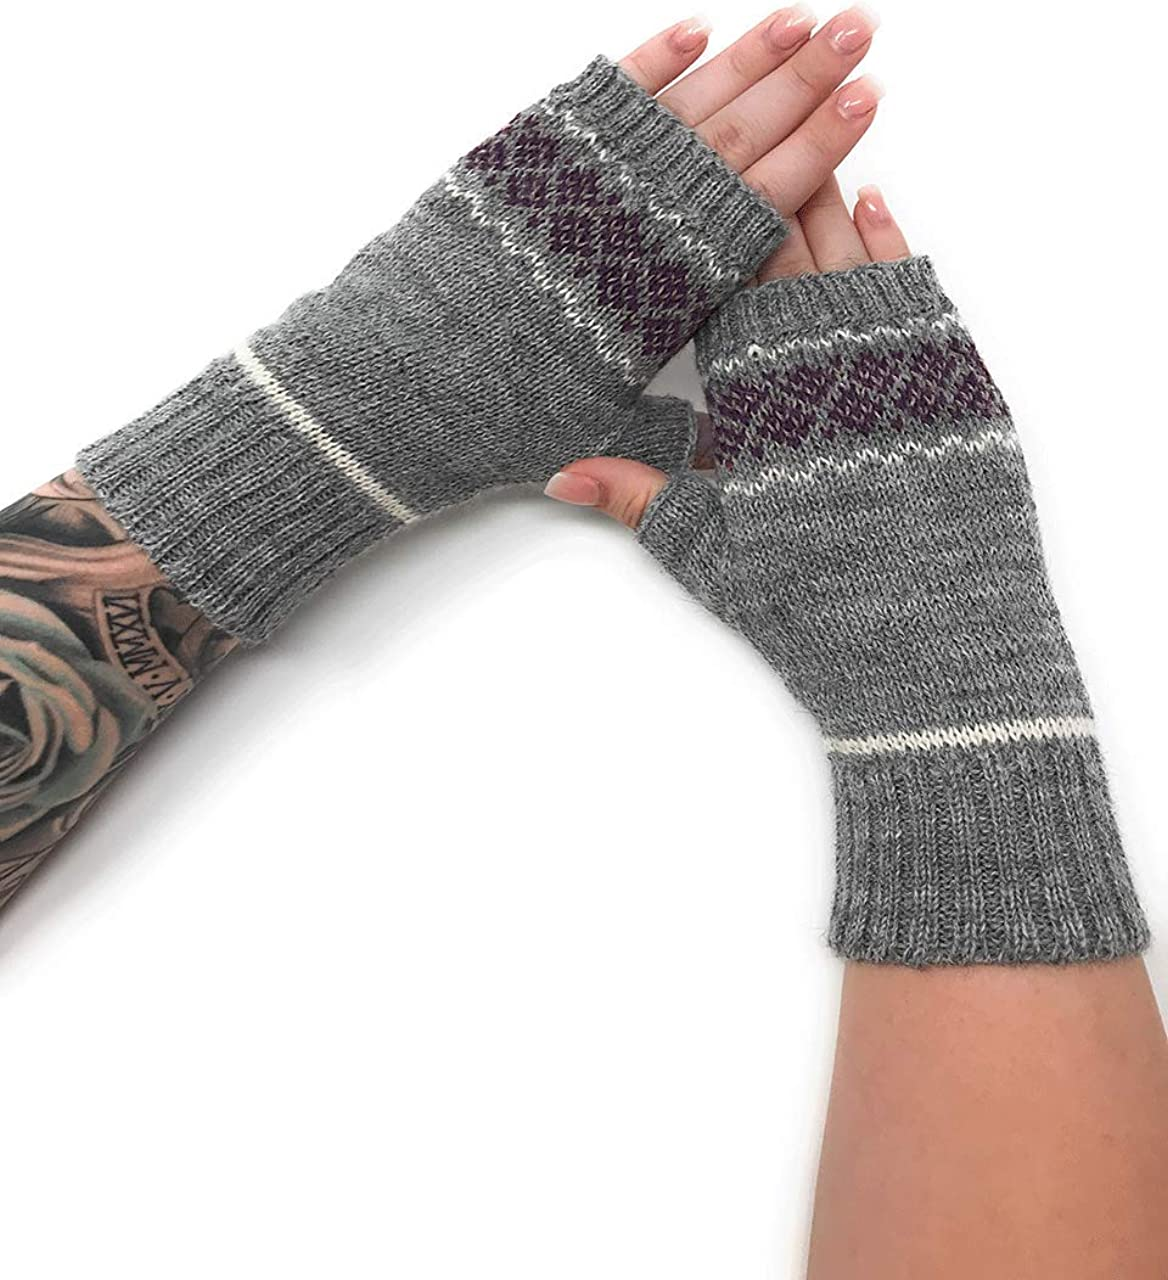 Inca Fashions - Women's 100% Alpaca Wool Fair Isle Geometric Fingerless Mittens -Texting Gloves - Wrist, Hand & Arm Warmers